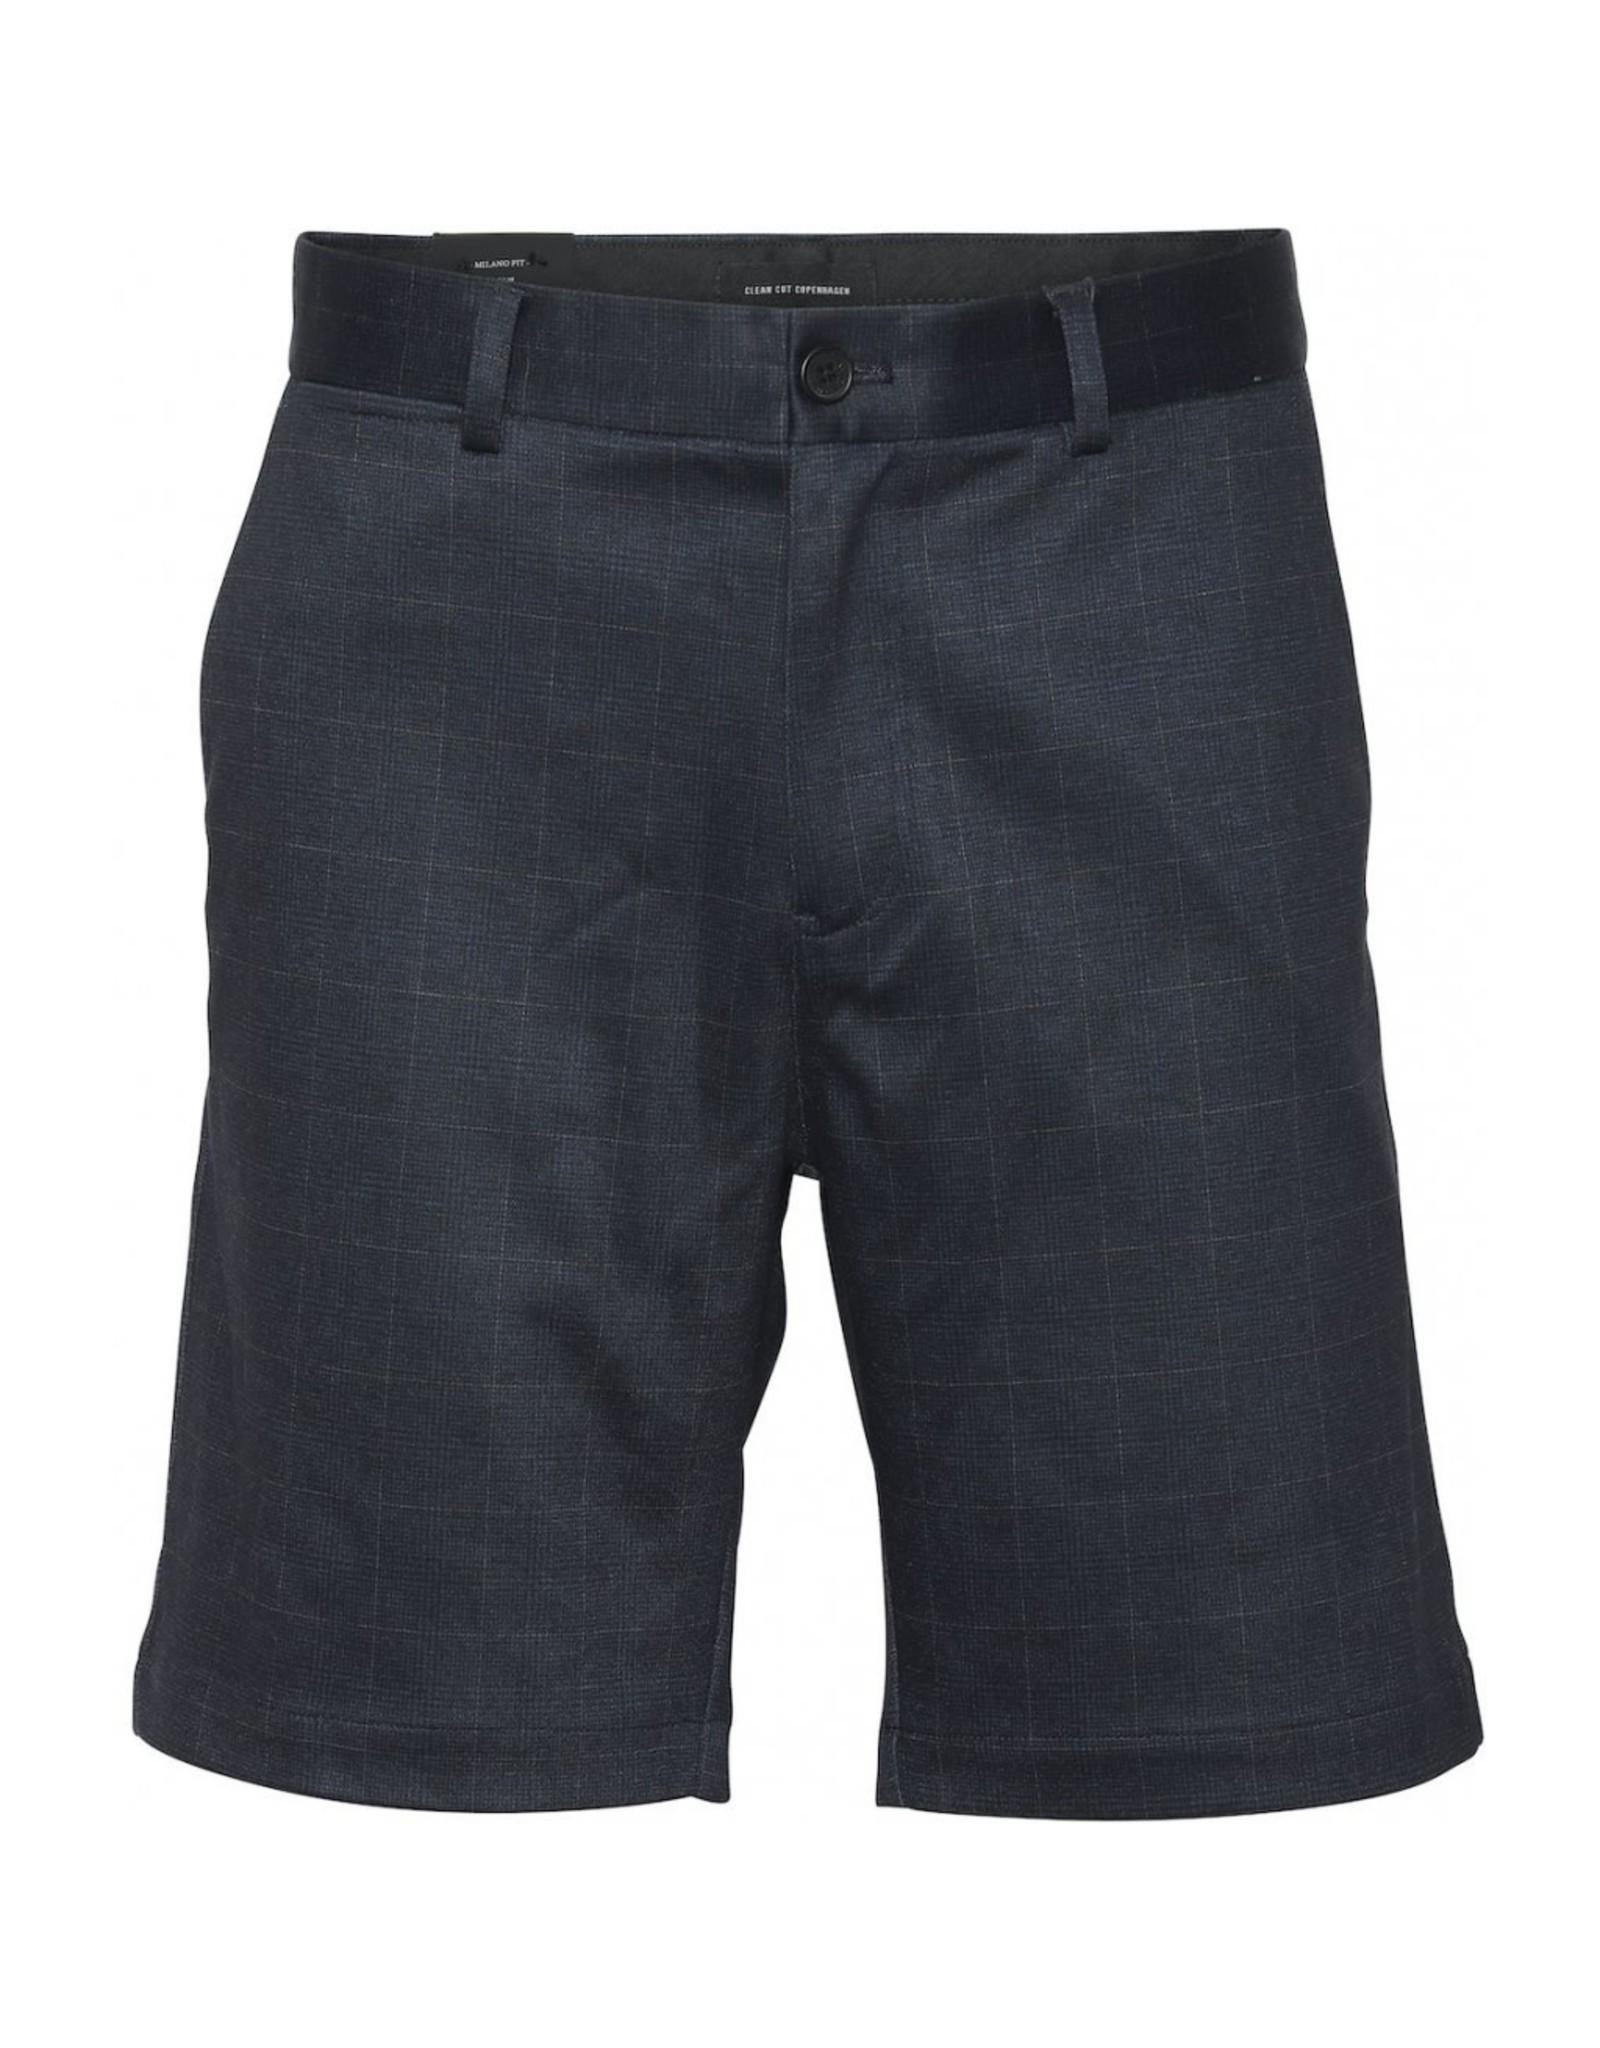 Clean Cut Copenhagen Milano Darren Stretch Shorts